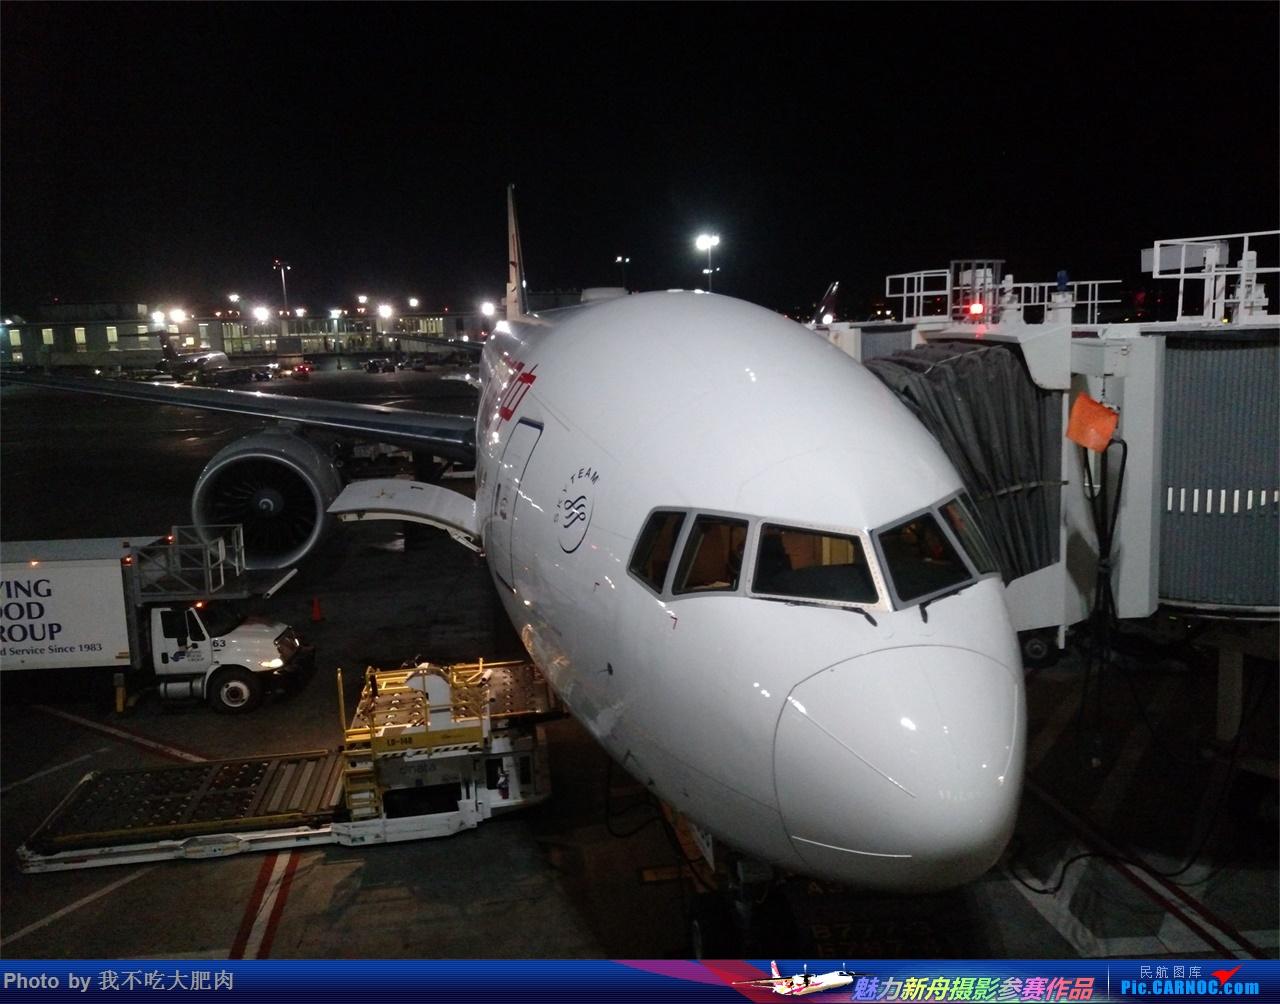 Re:[原创]挪威航空 Norwegian Airlines 纽约伦敦伪首发 BOEING 777-300ER  JFK